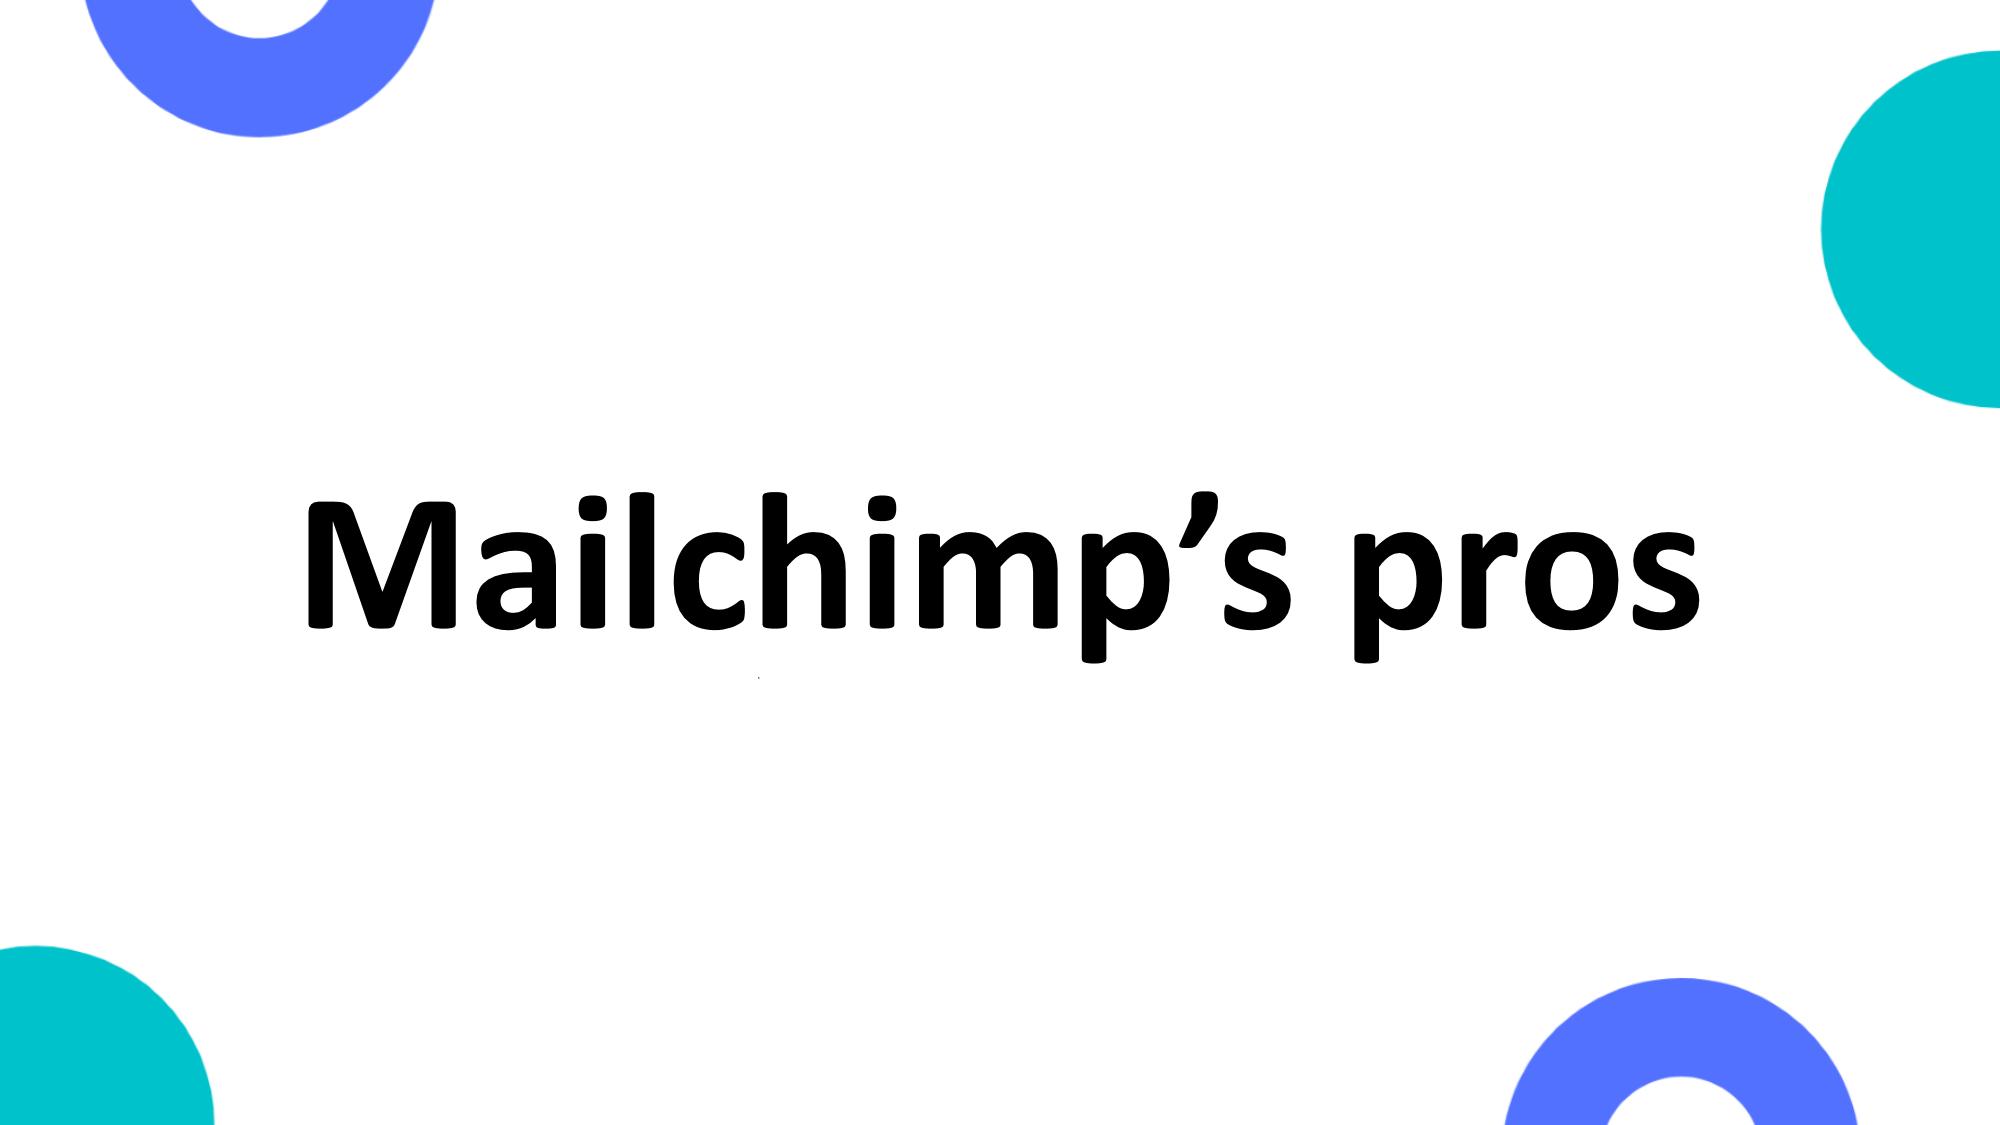 Mailchimp's pros